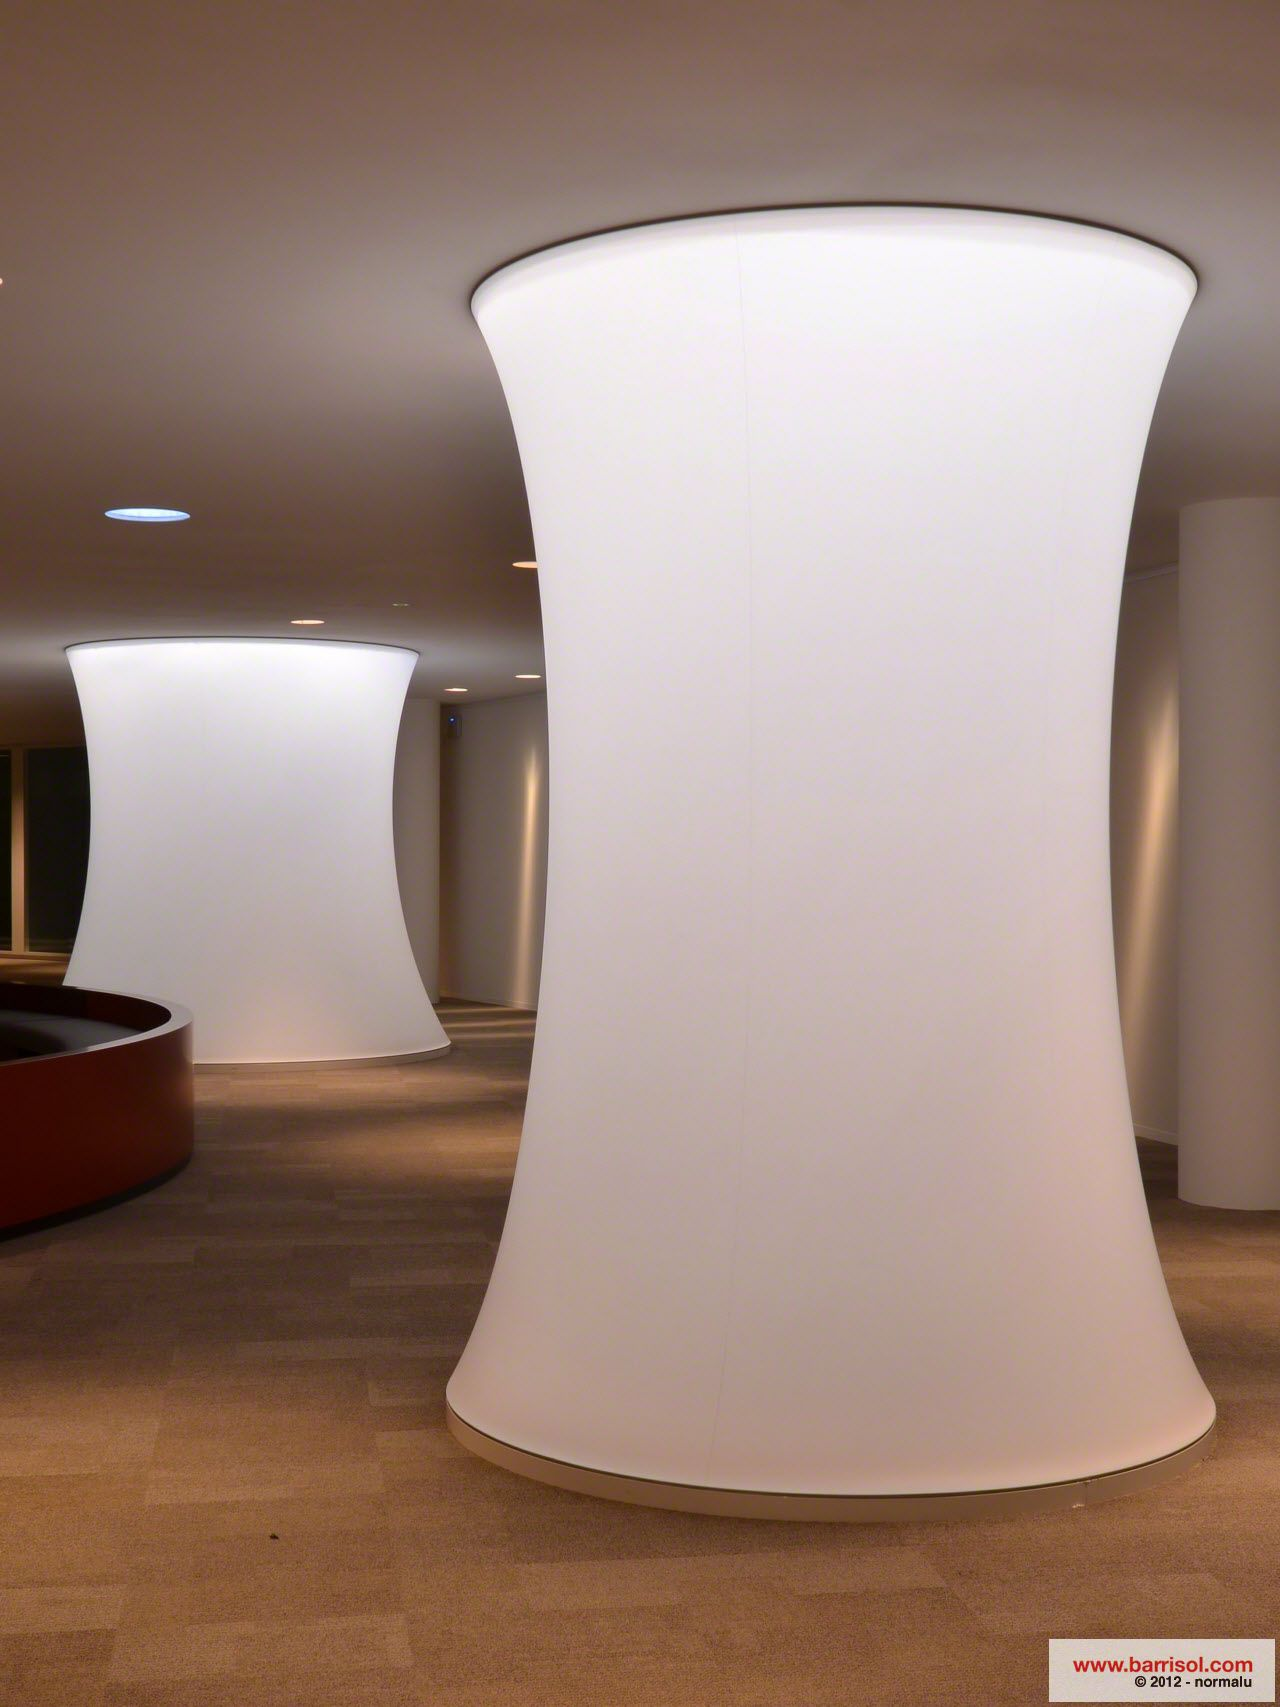 light columns by barrisolcom